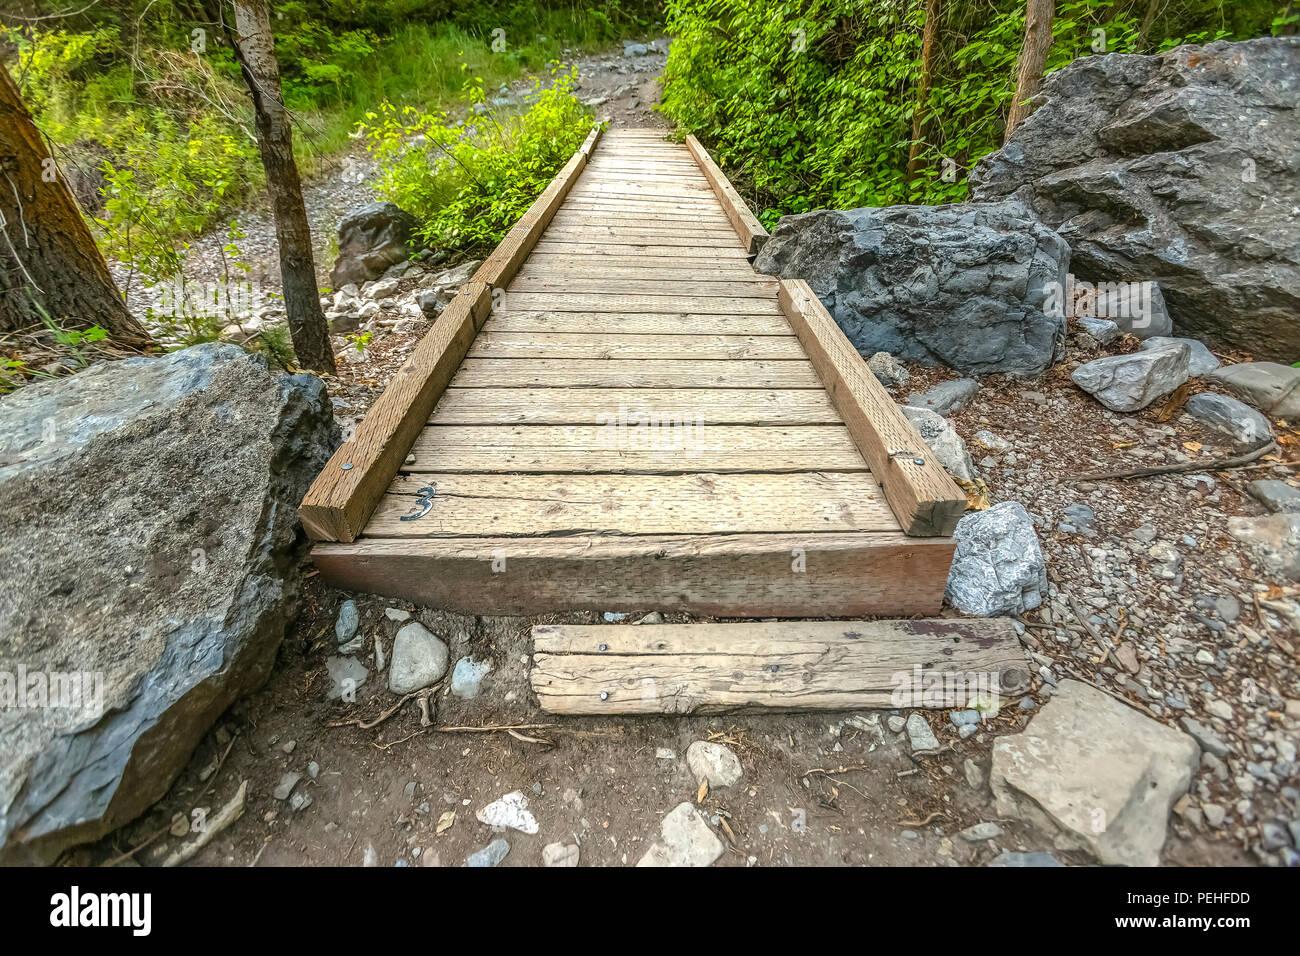 Wooden bridge with no rails over stream - Stock Image